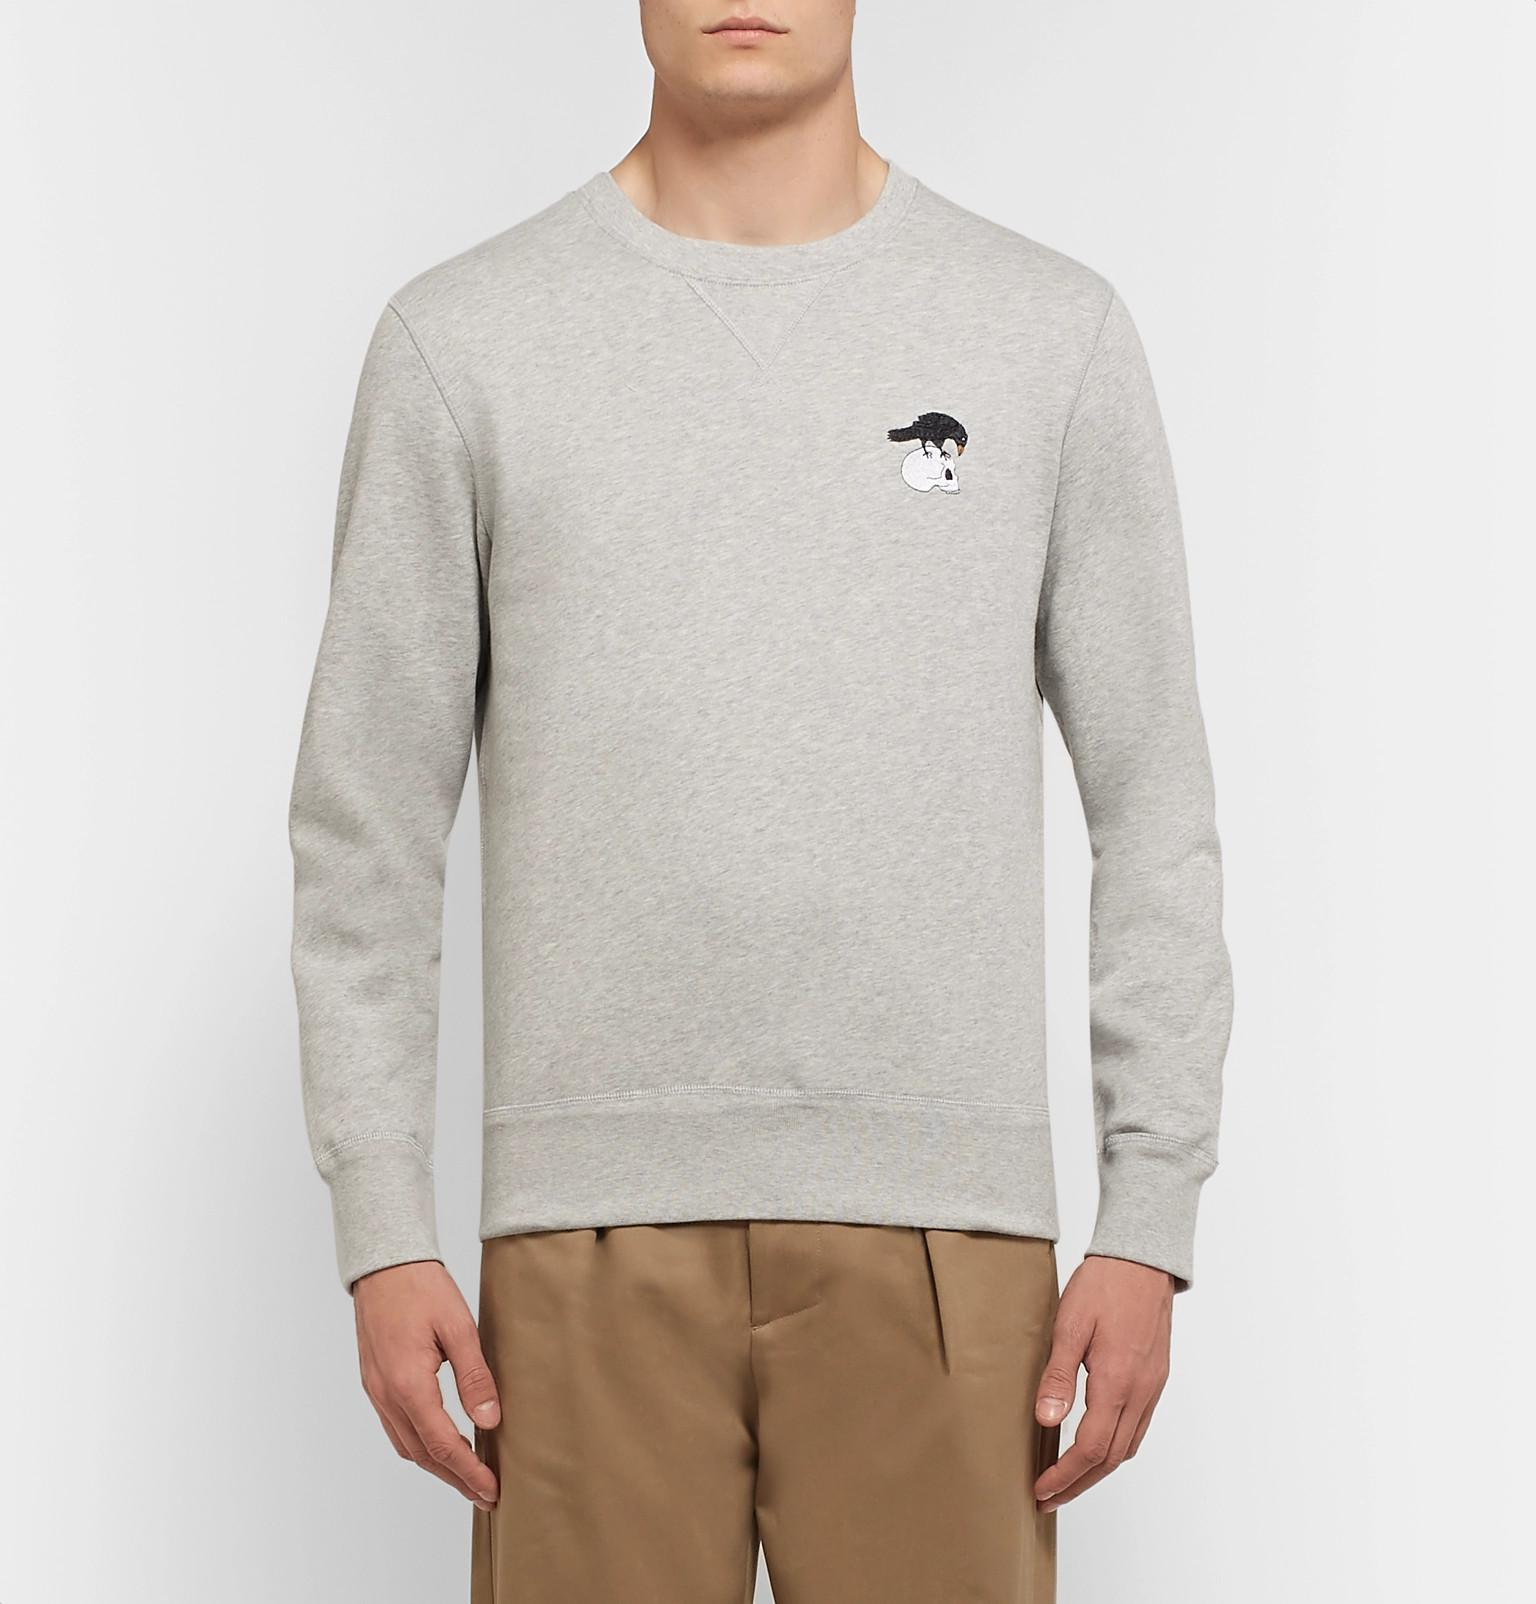 Mélange Back Blend Jersey Gray Sweatshirt Fleece Mcqueen For Alexander  Fullscreen Embroidered View Men Cotton tf4qXxw 98fc6bff35c